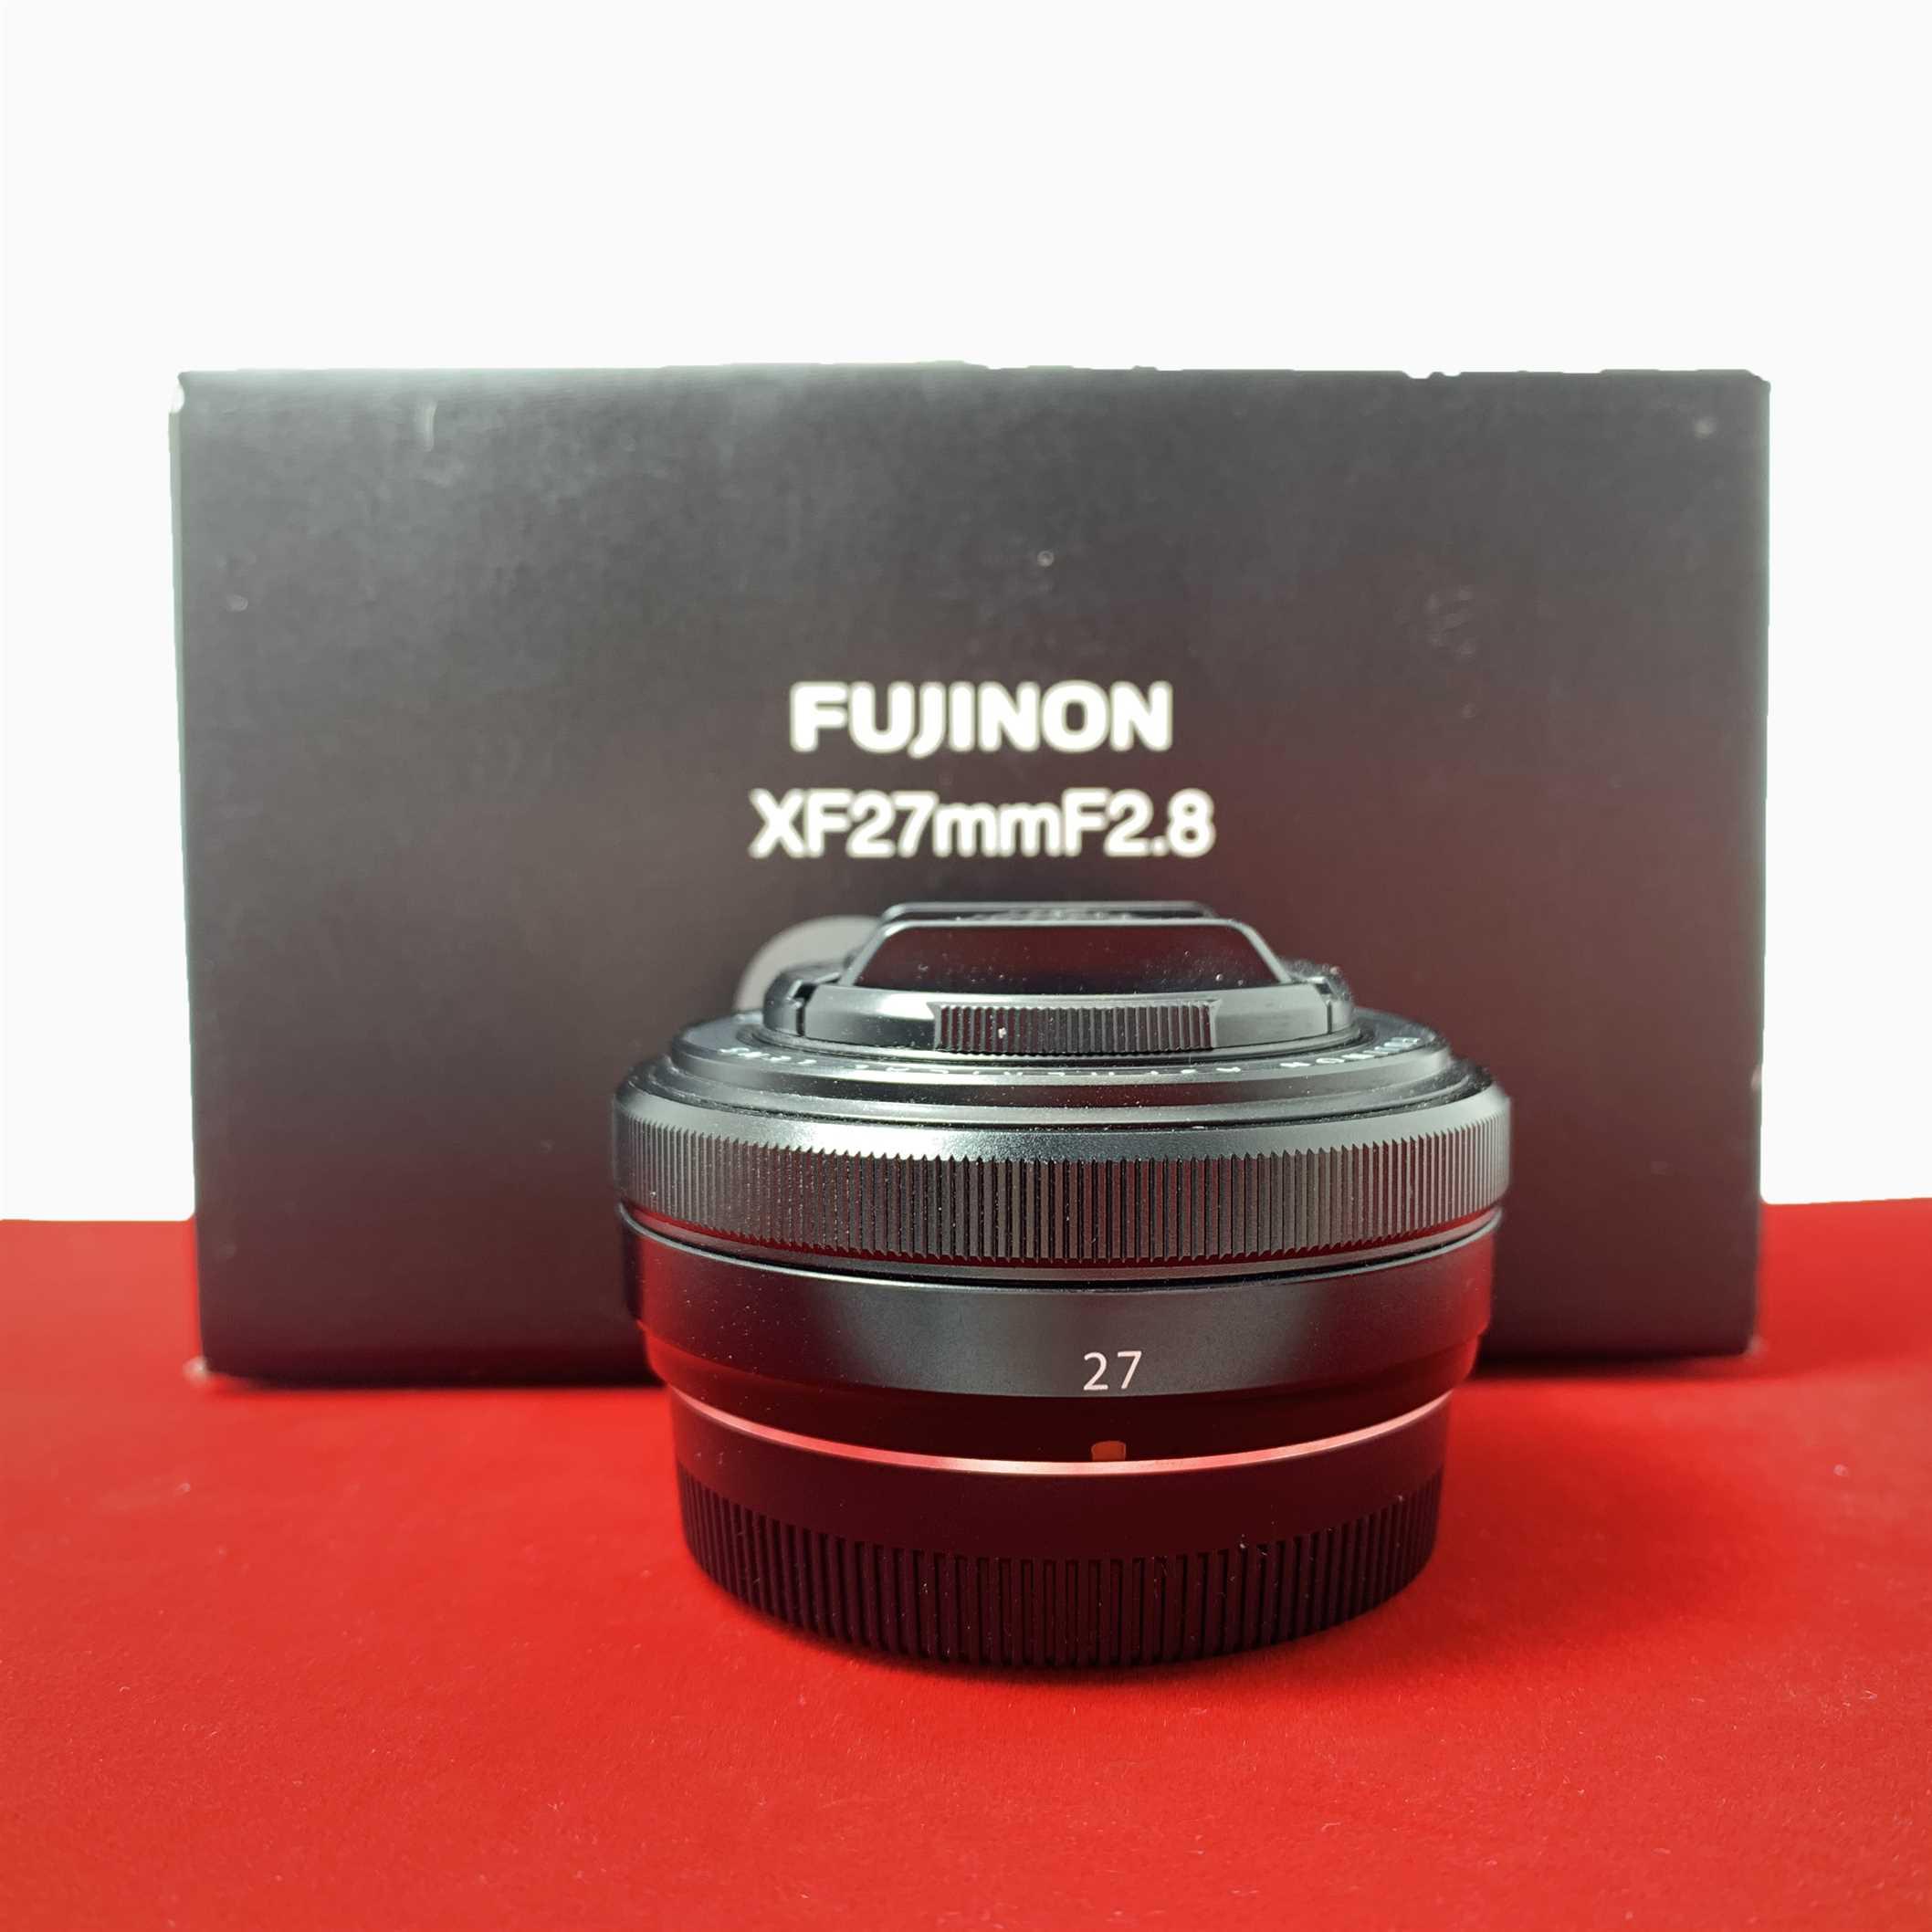 [USED-PJ33] Fujifilm 27MM F2.8 XF Lens,95% Like New Condition (S/N:61A01159)